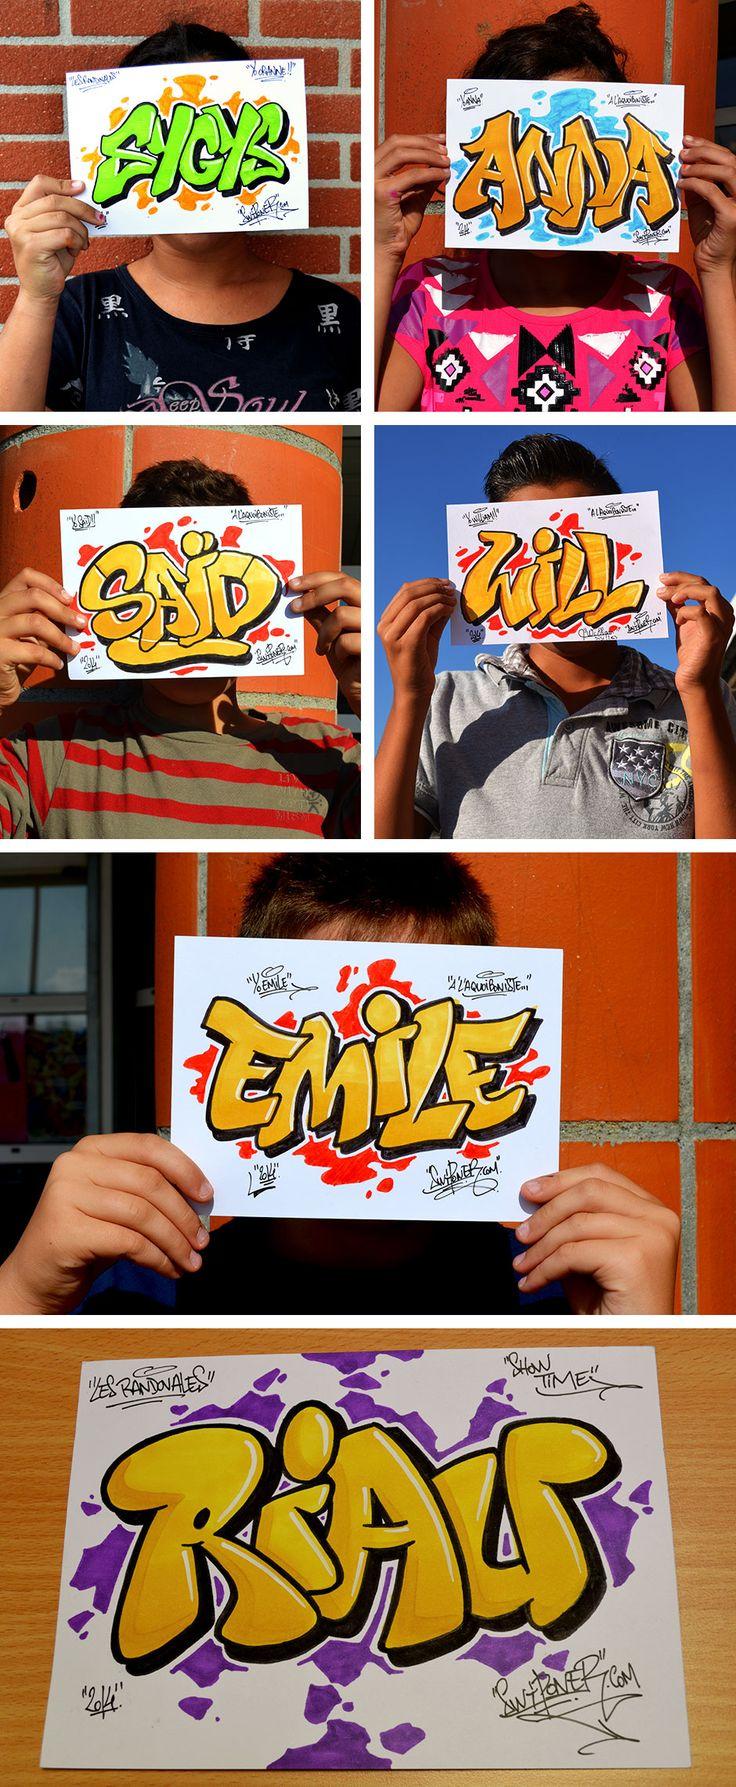 Animation graffiti prénoms par swiponer, wxp crew Toulouse, www.swiponer.com